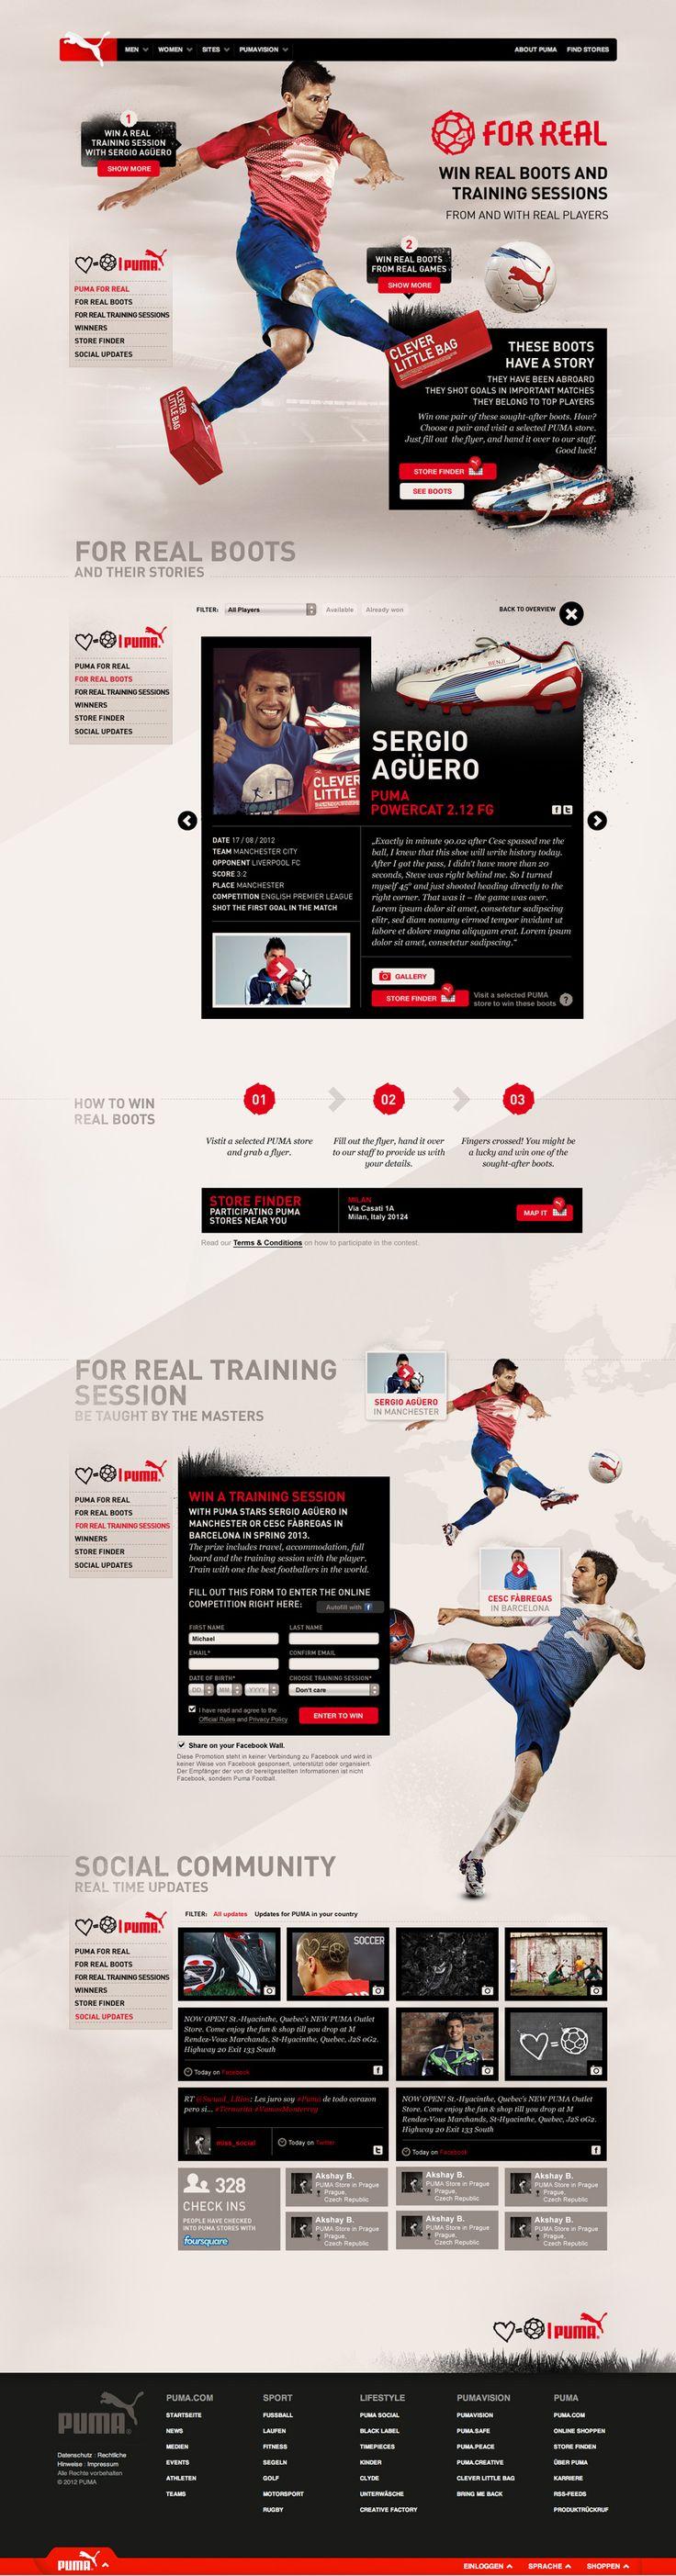 Unique Web Design, Puma #webdesign #design (http://www.pinterest.com/aldenchong/)